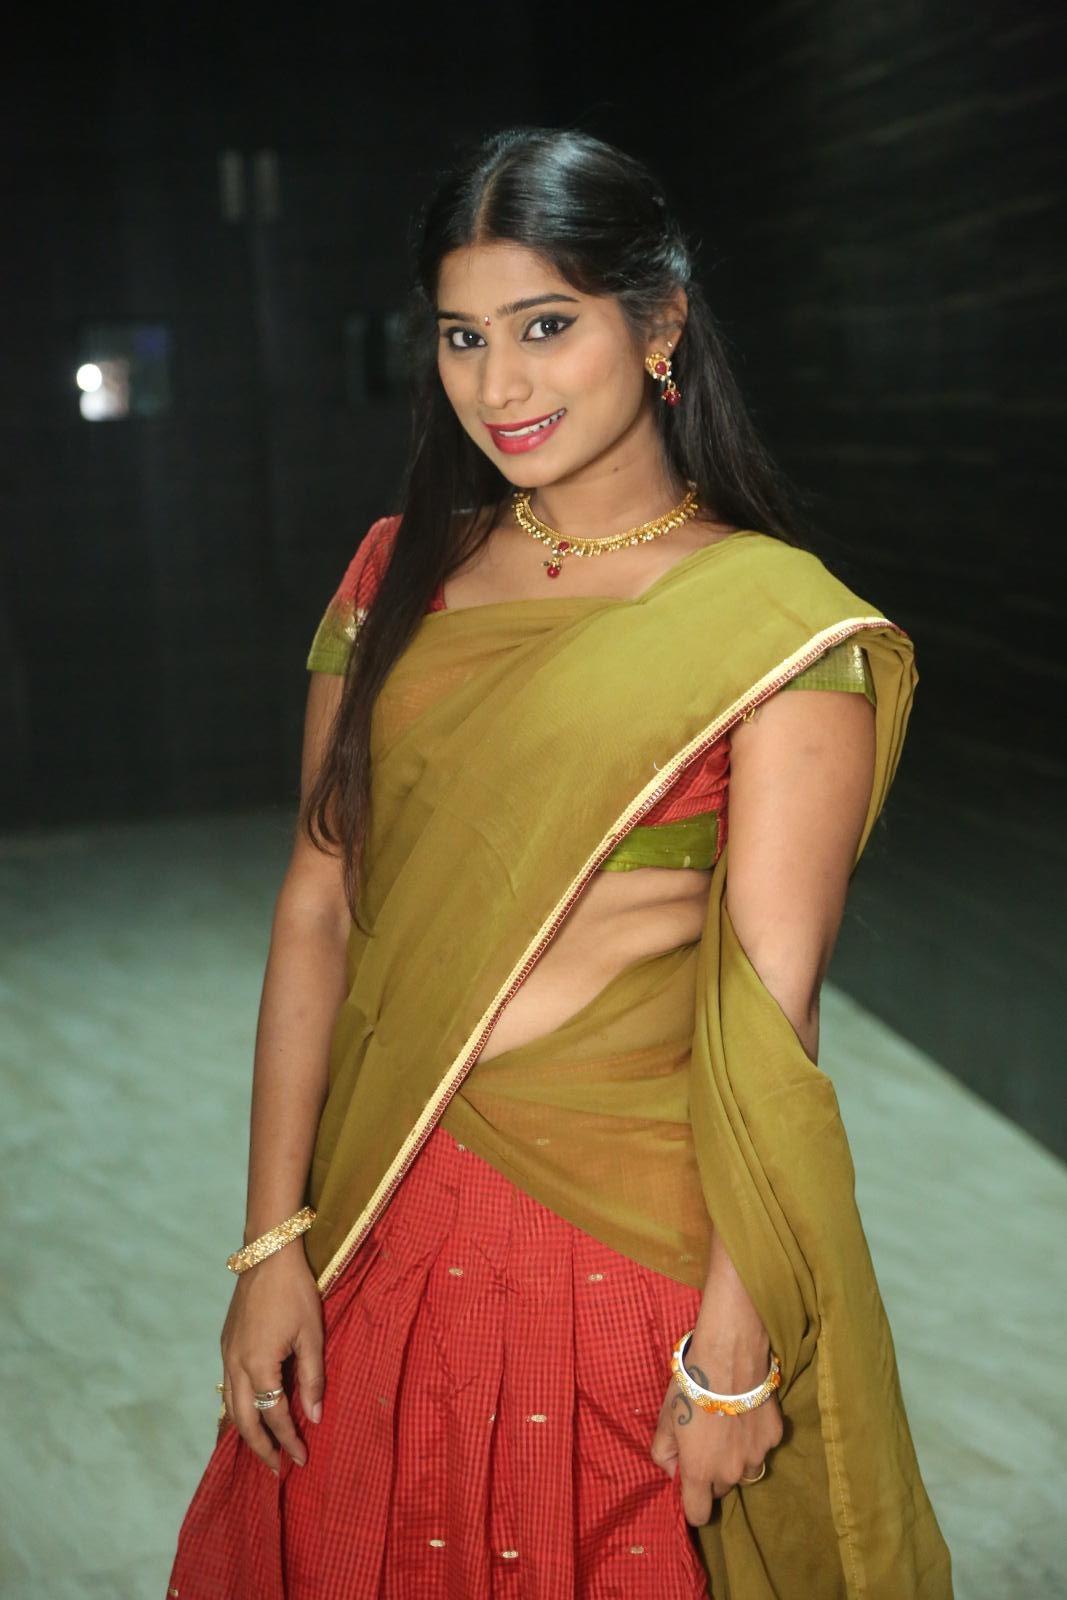 Midhuna Latest Half Saree Photos Gallery - Hd Latest Tamil -5793